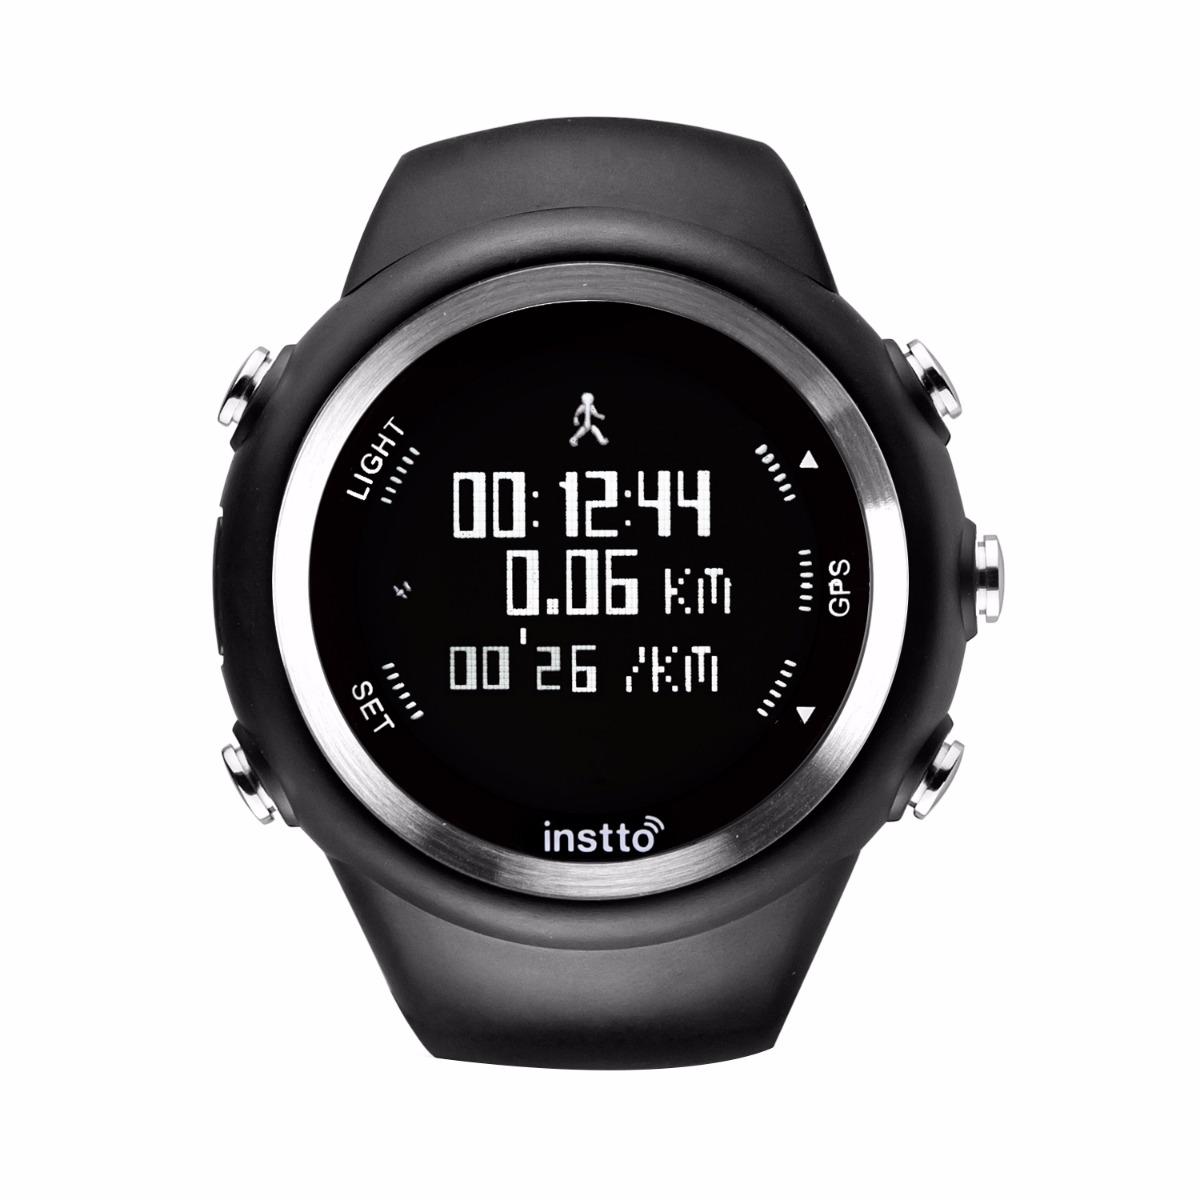 ce6e865dfb2f reloj deportivo instto insport 3 running sumergible gps. Cargando zoom.